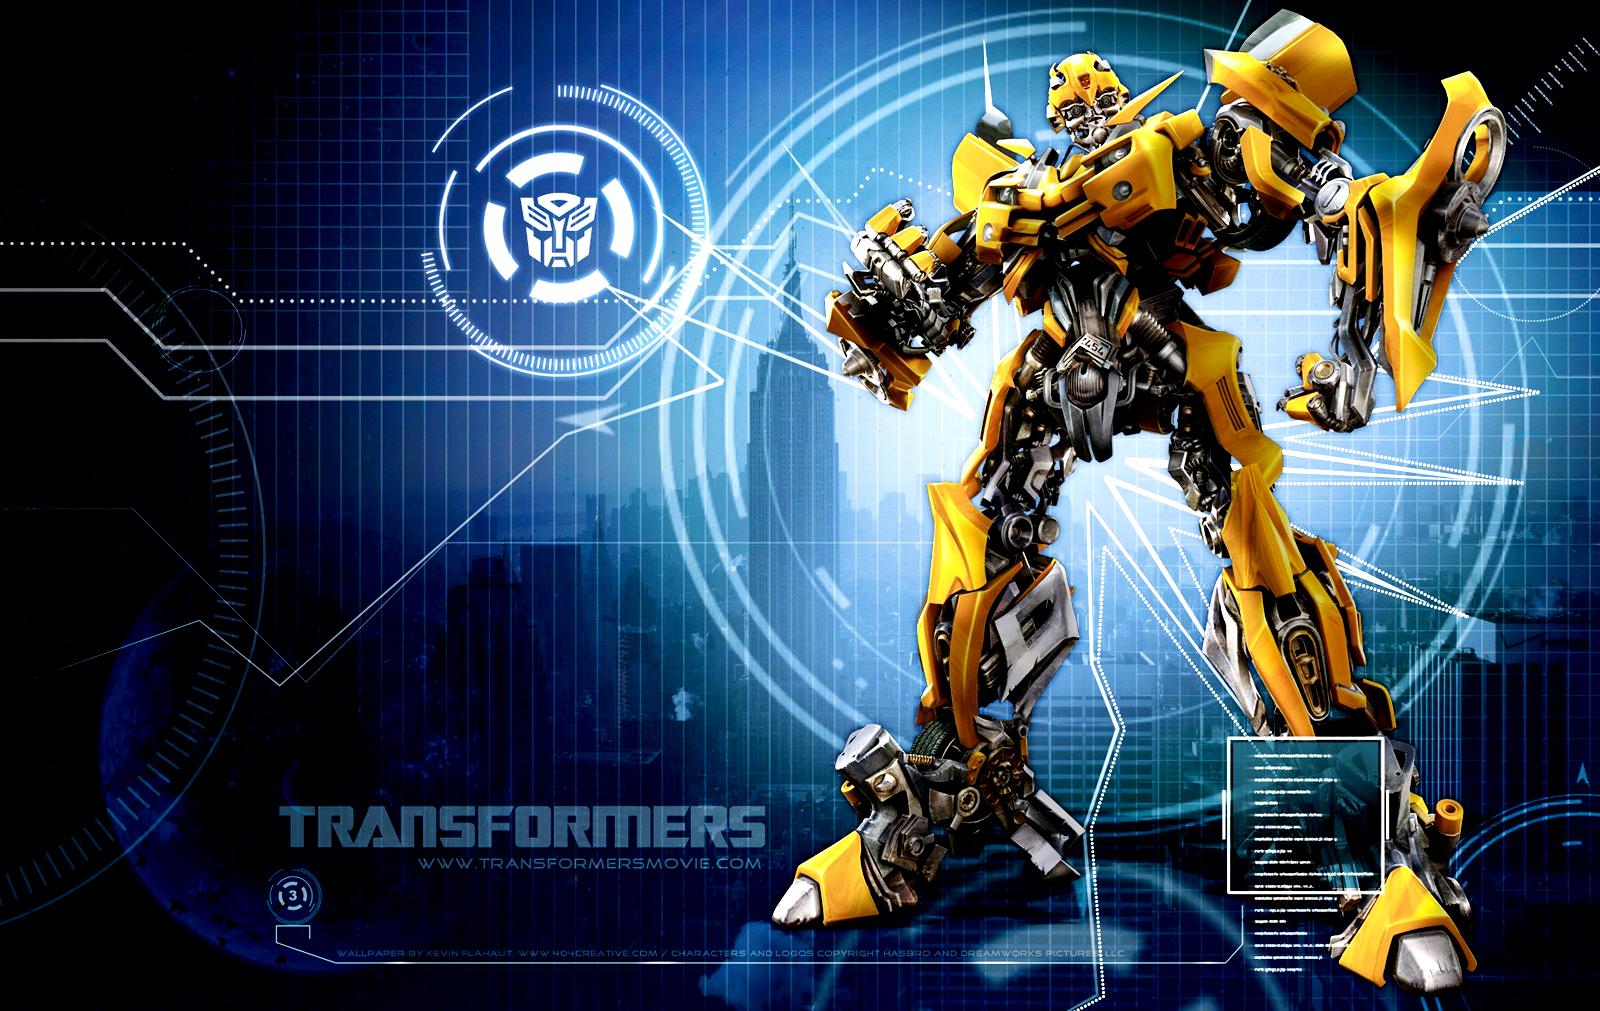 Transformers wallpapers hd wallpapersafari - Bumblebee desktop wallpapers ...